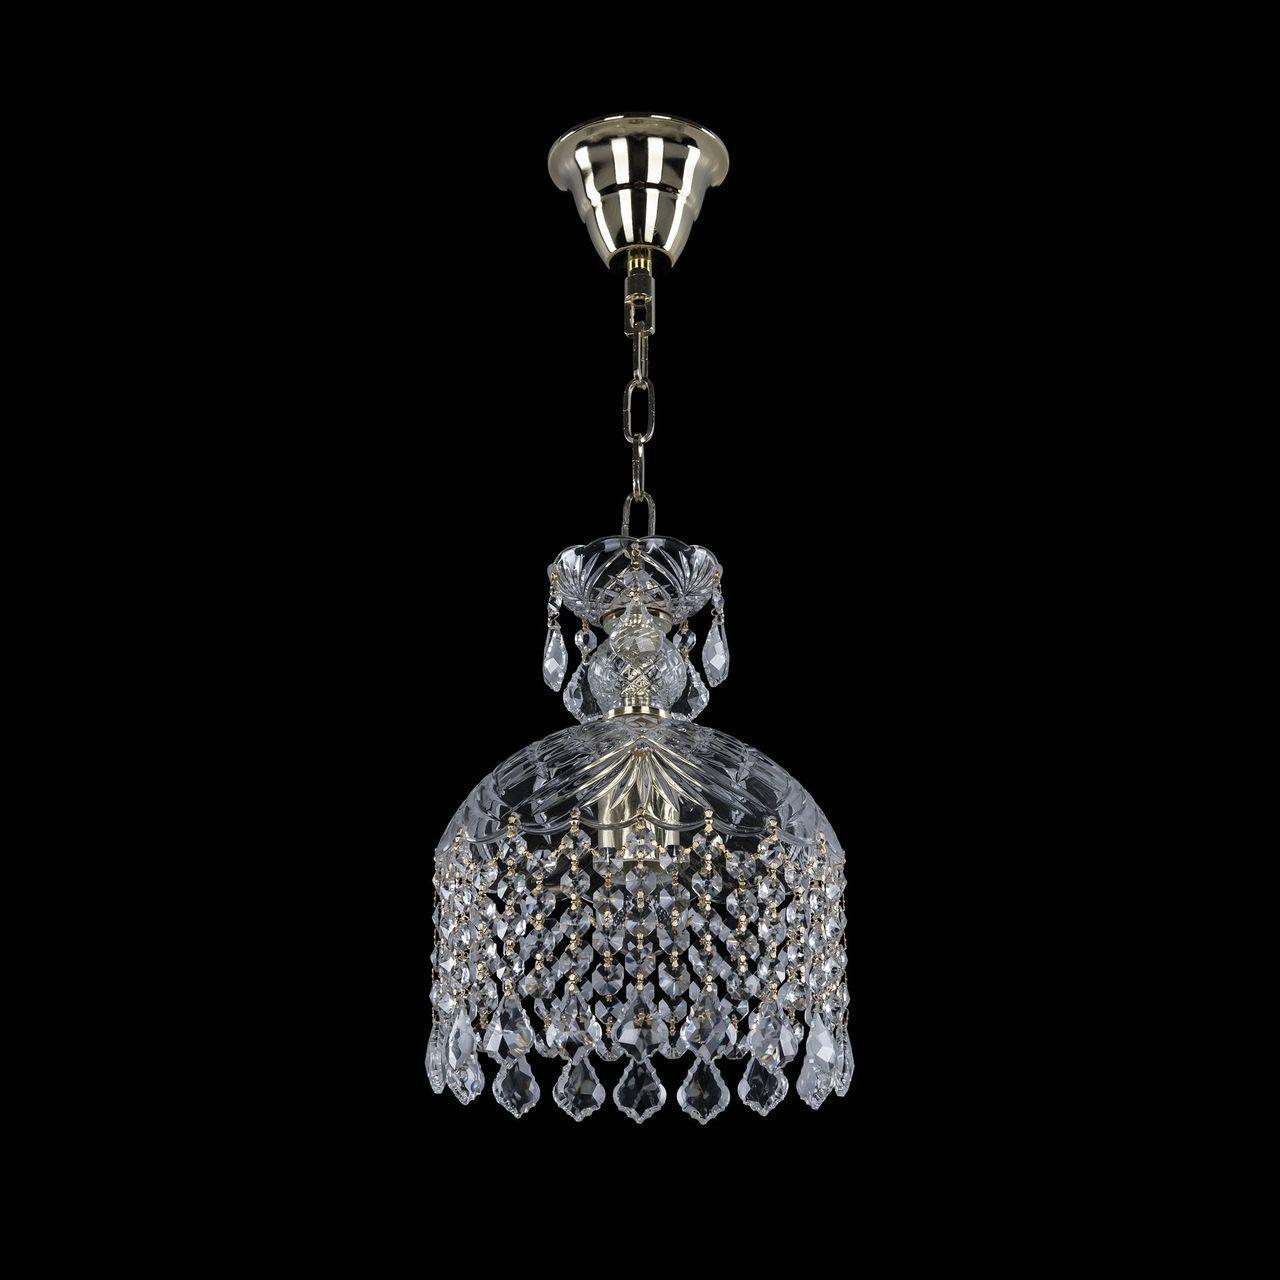 Подвесной светильник Bohemia Ivele 14783/20 G Leafs